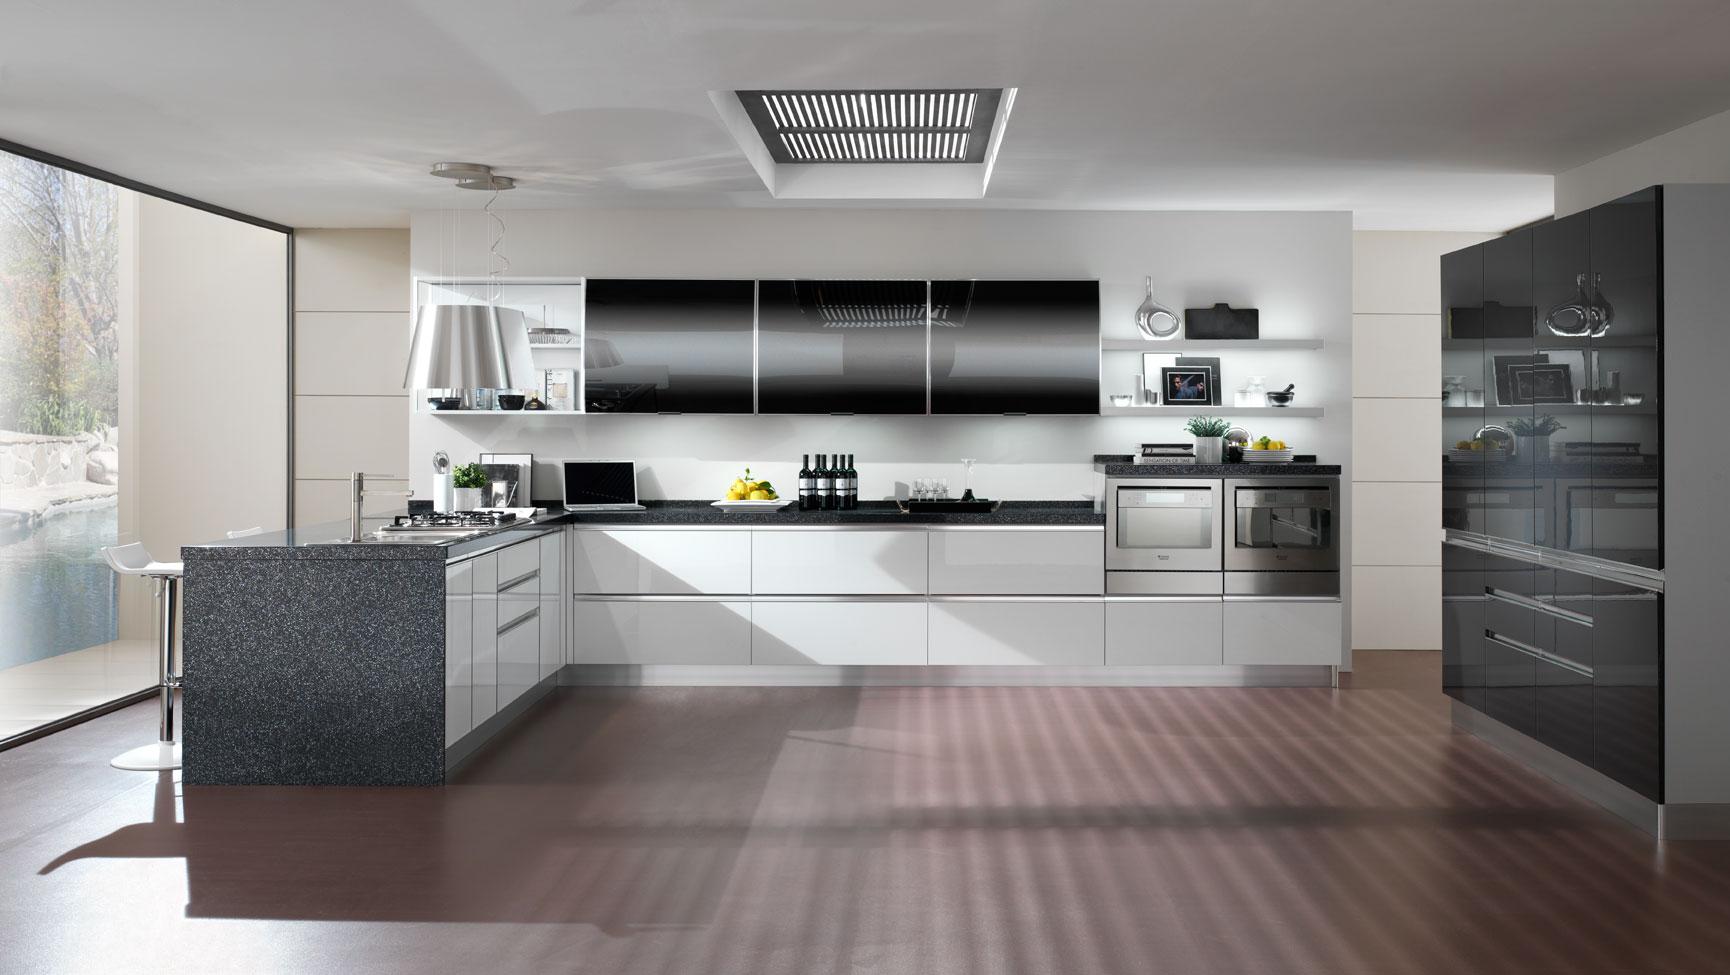 Cucine moderne for Programma per comporre cucine